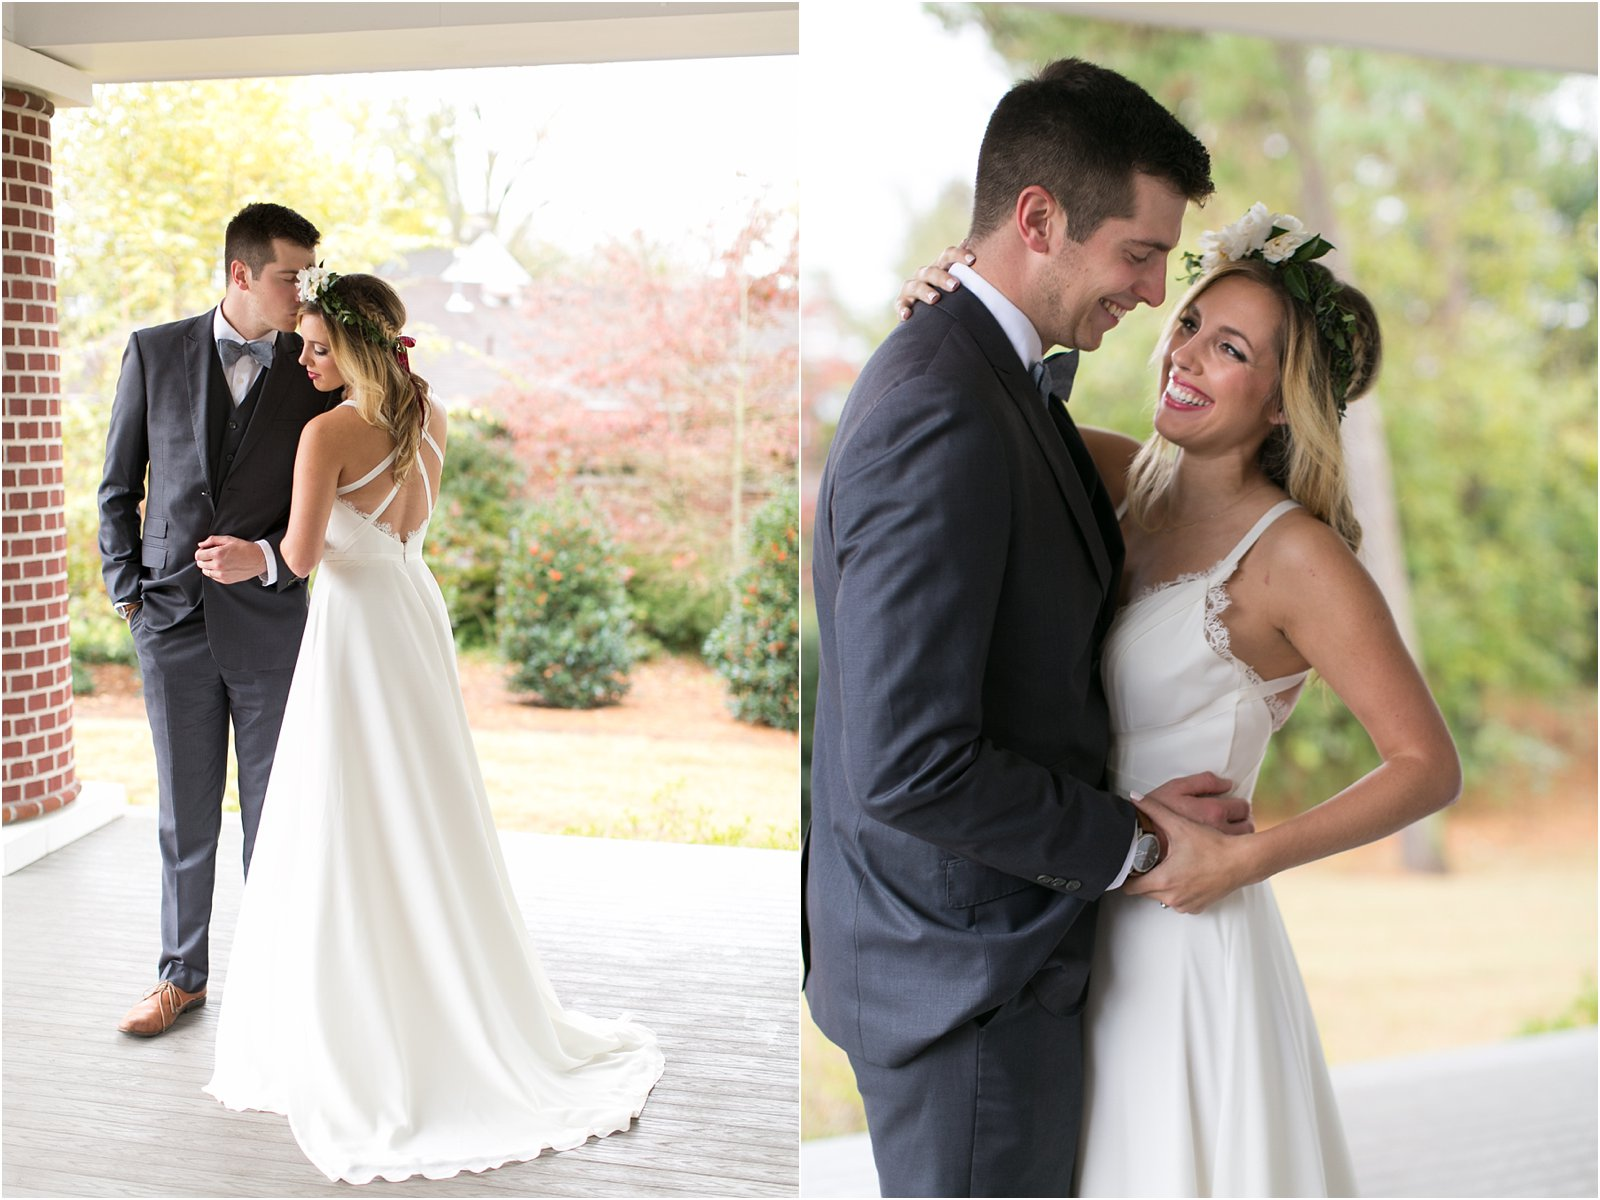 jessica_ryan_photography_womans_club_of_portsmouth_wedding_walk_through_a_wedding_bride_and_groom_0196